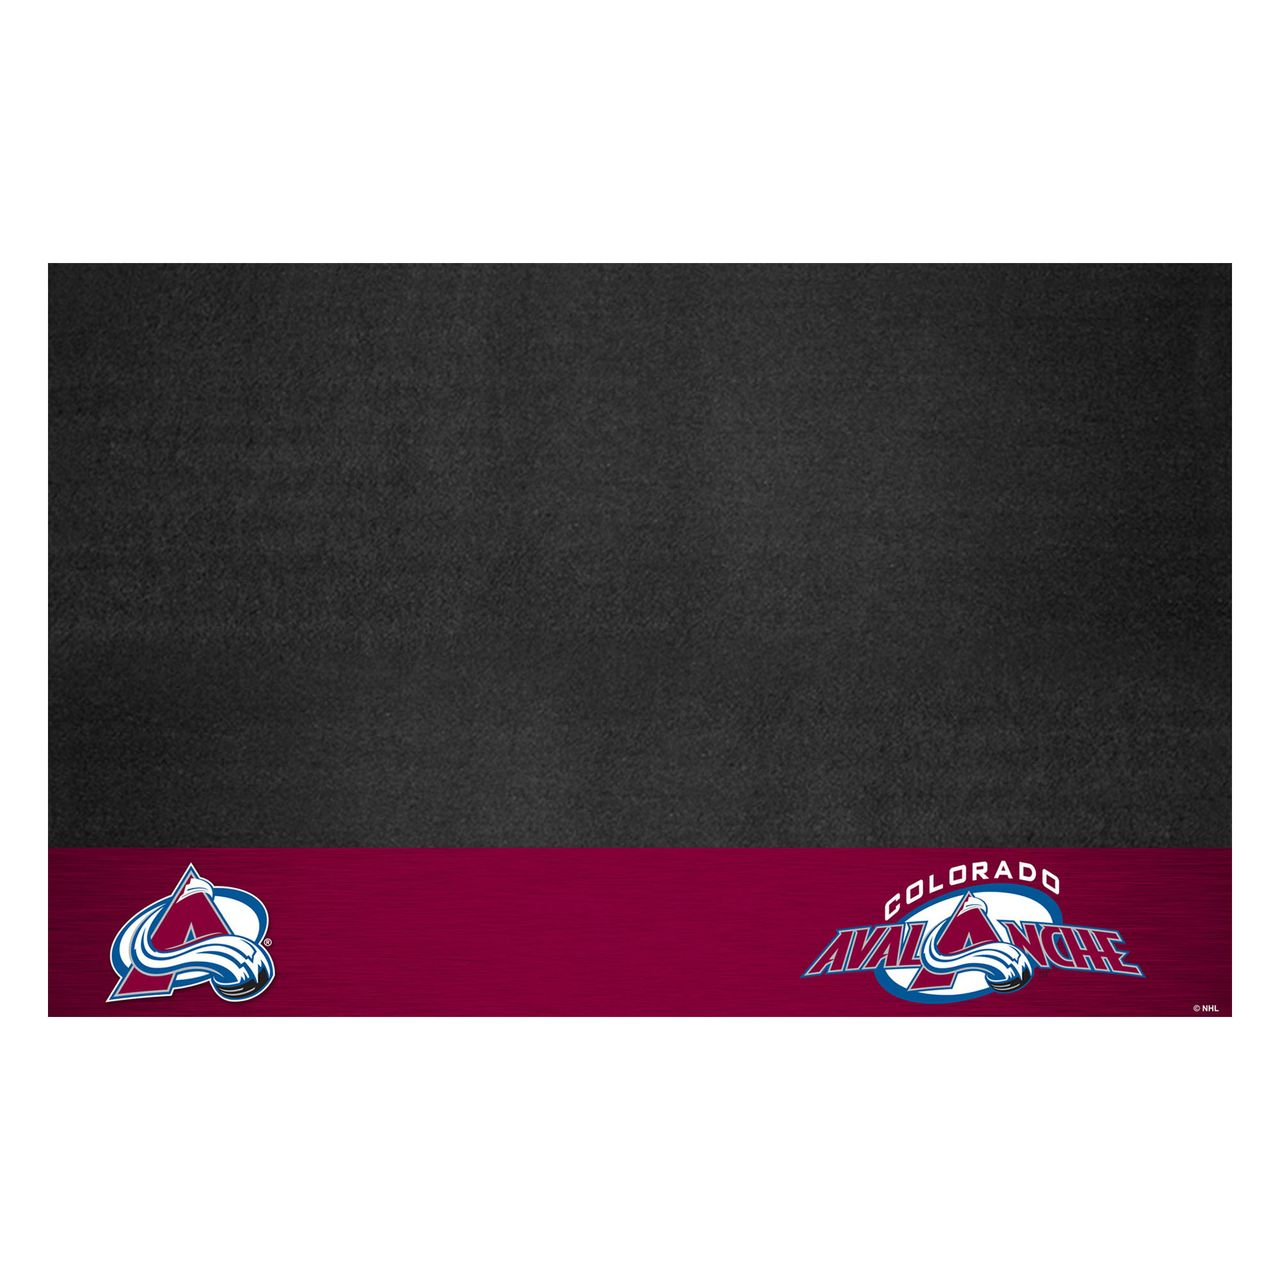 "Fanmats 14231 NHL - Colorado Avalanche Grill Mat 26""x42"""